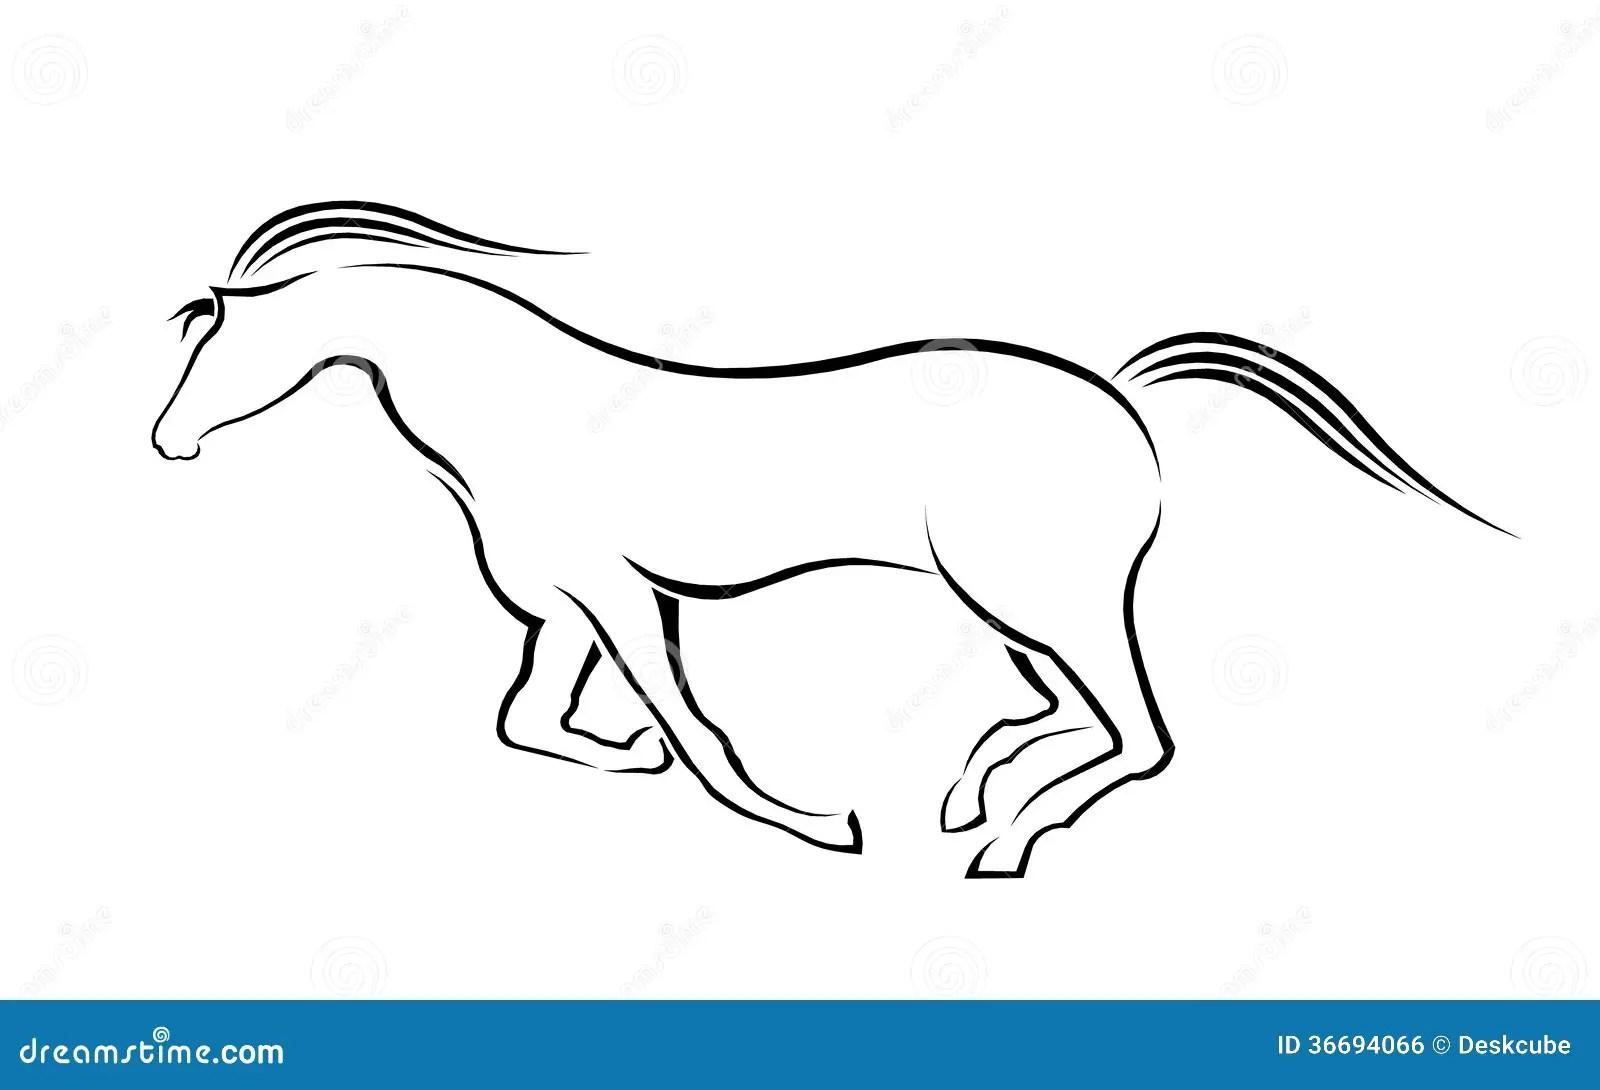 Running Horse Silhouette Stock Vector Illustration Of